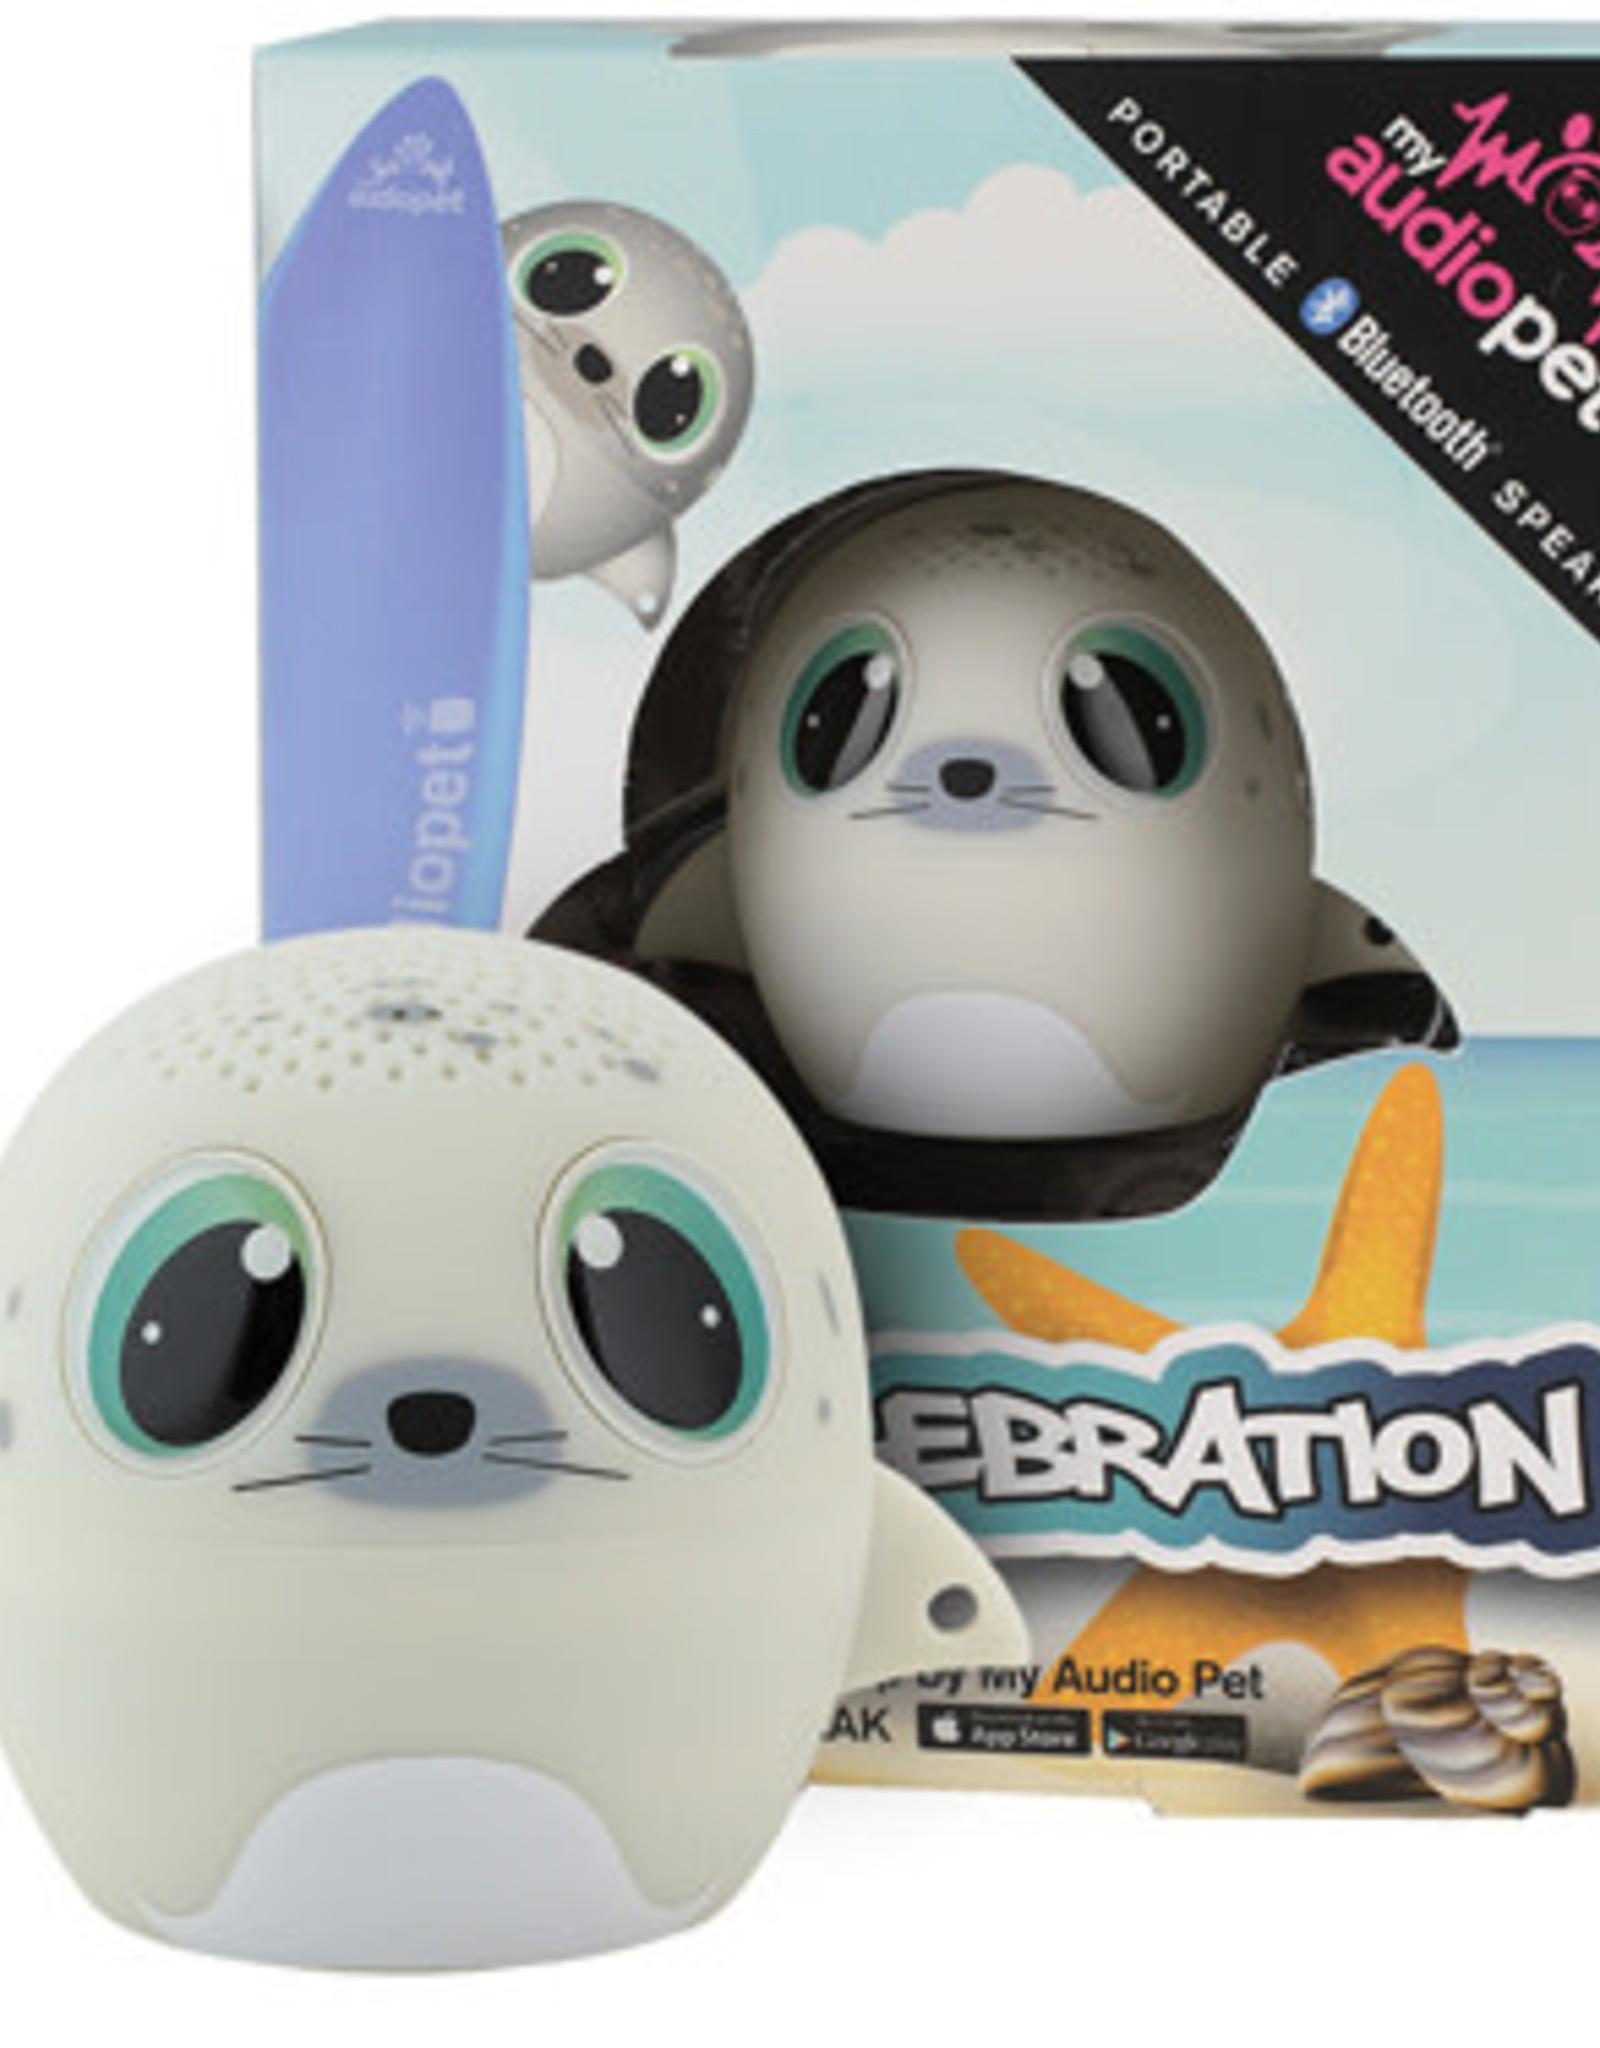 My Audio Pet My Audio Pet Bluetooth Speaker Seal – SEALebration